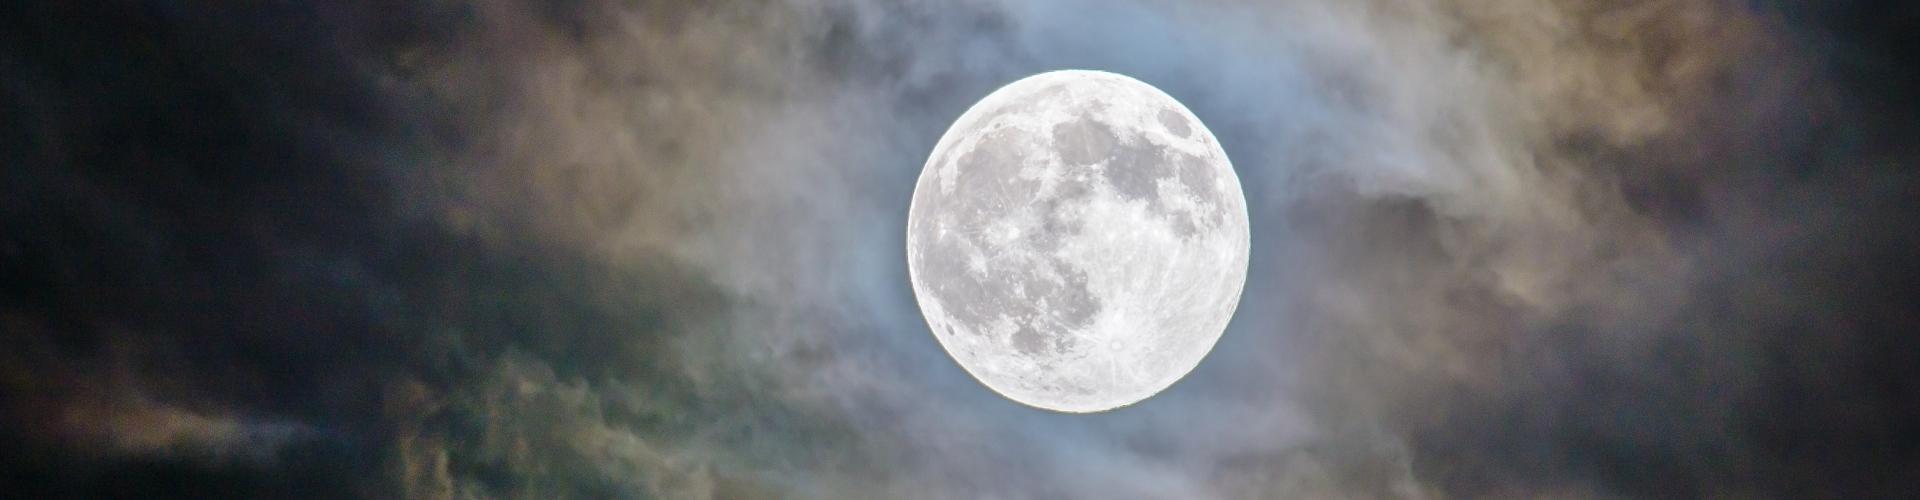 volle-maan-green-goddess-natuurgeneeskunde